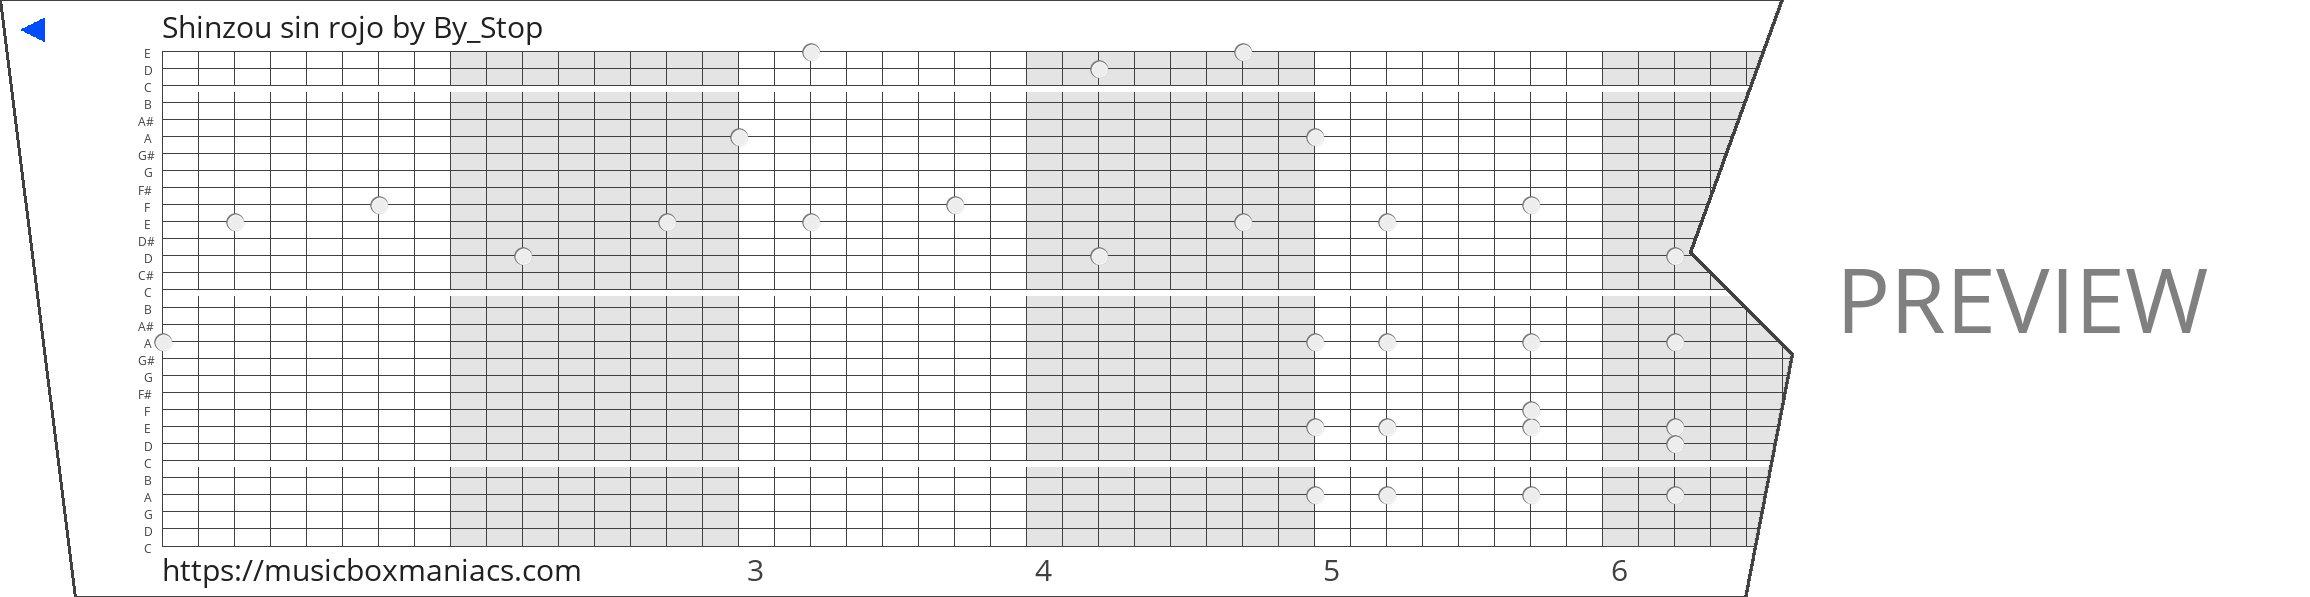 Shinzou sin rojo 30 note music box paper strip